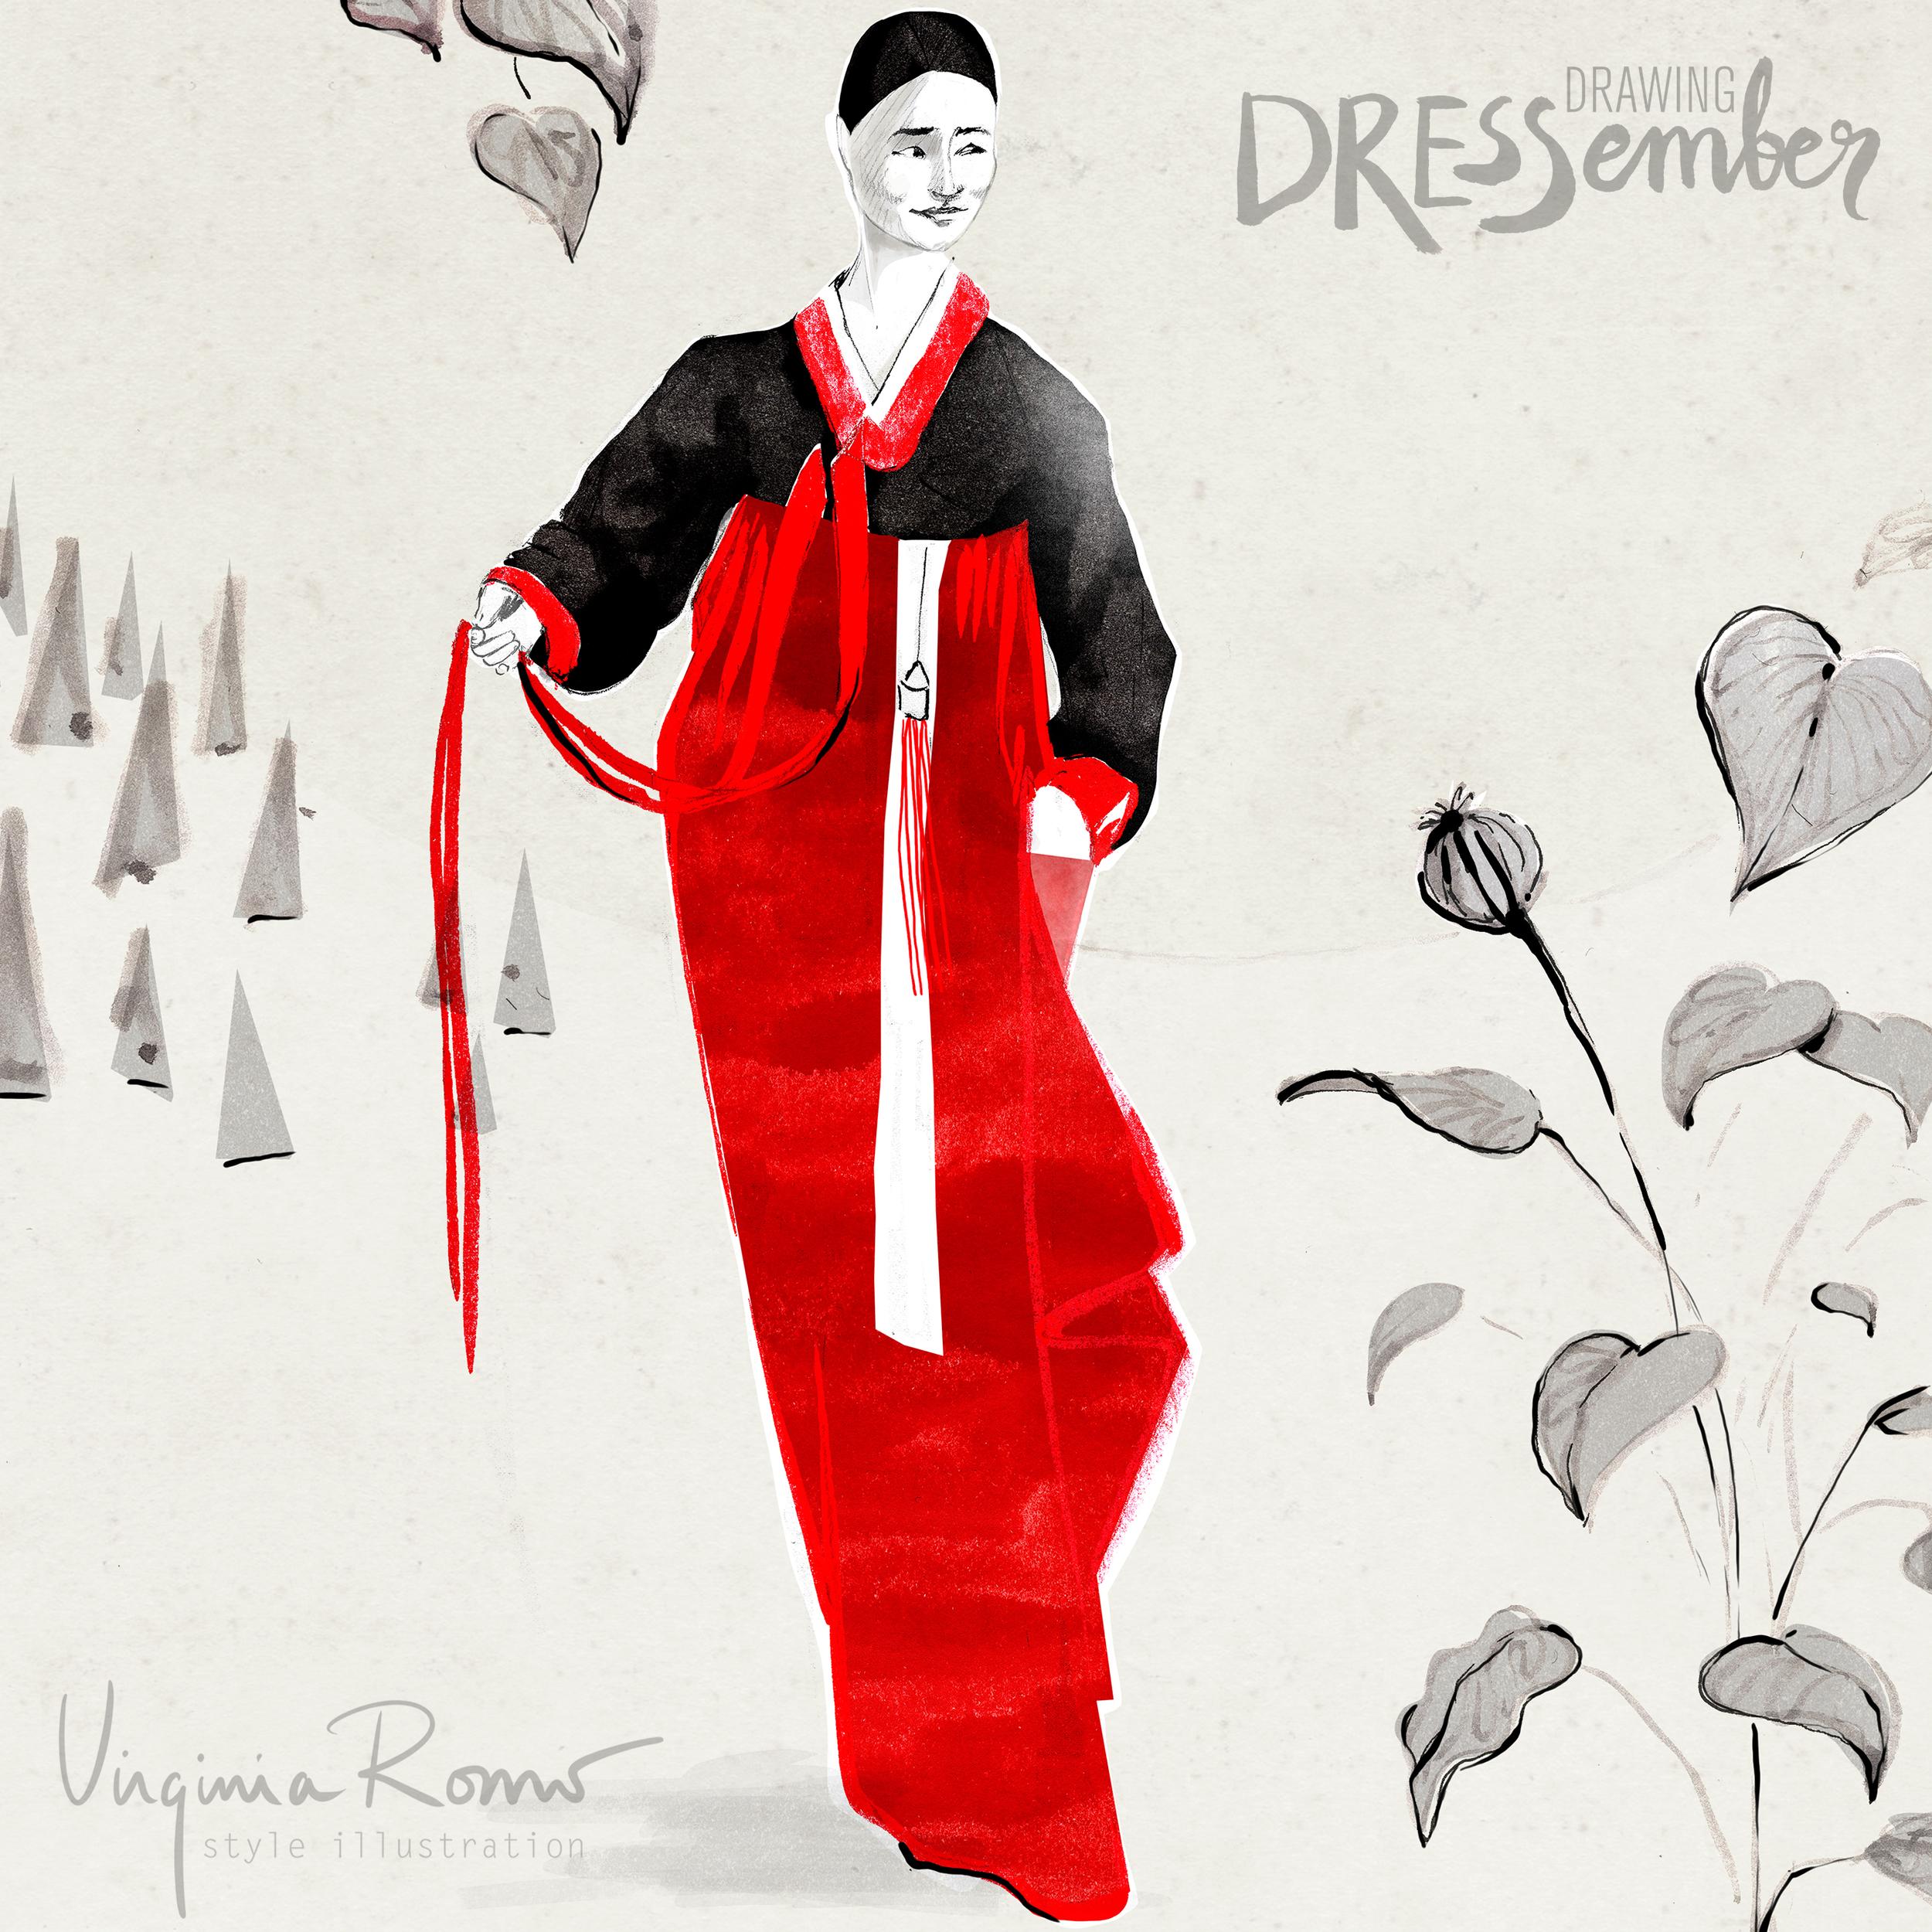 dressember-VirginiaRomoIllustration-01-Isa-IG.jpg